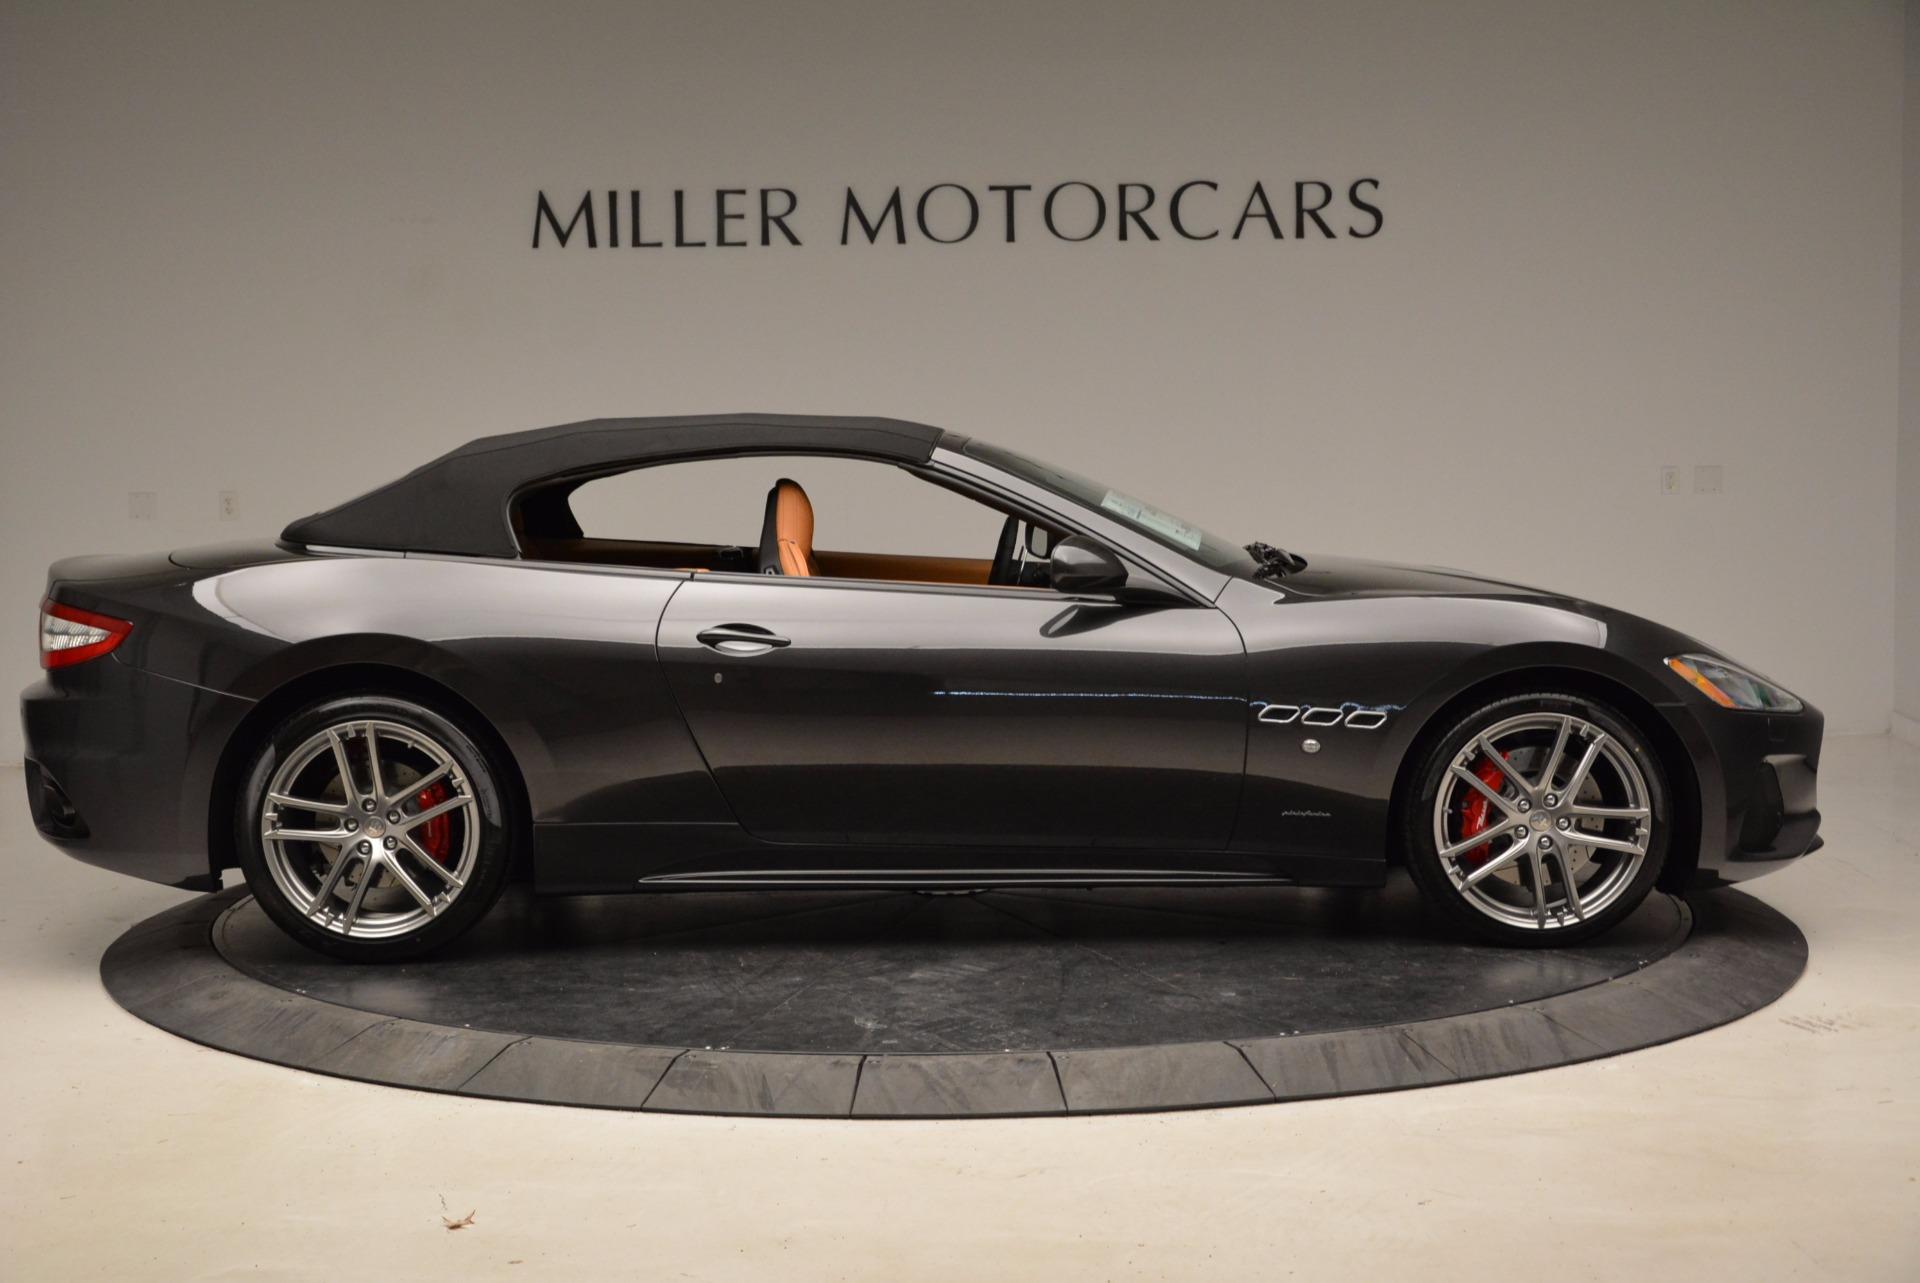 New 2018 Maserati GranTurismo Sport Convertible For Sale In Westport, CT 1869_p9